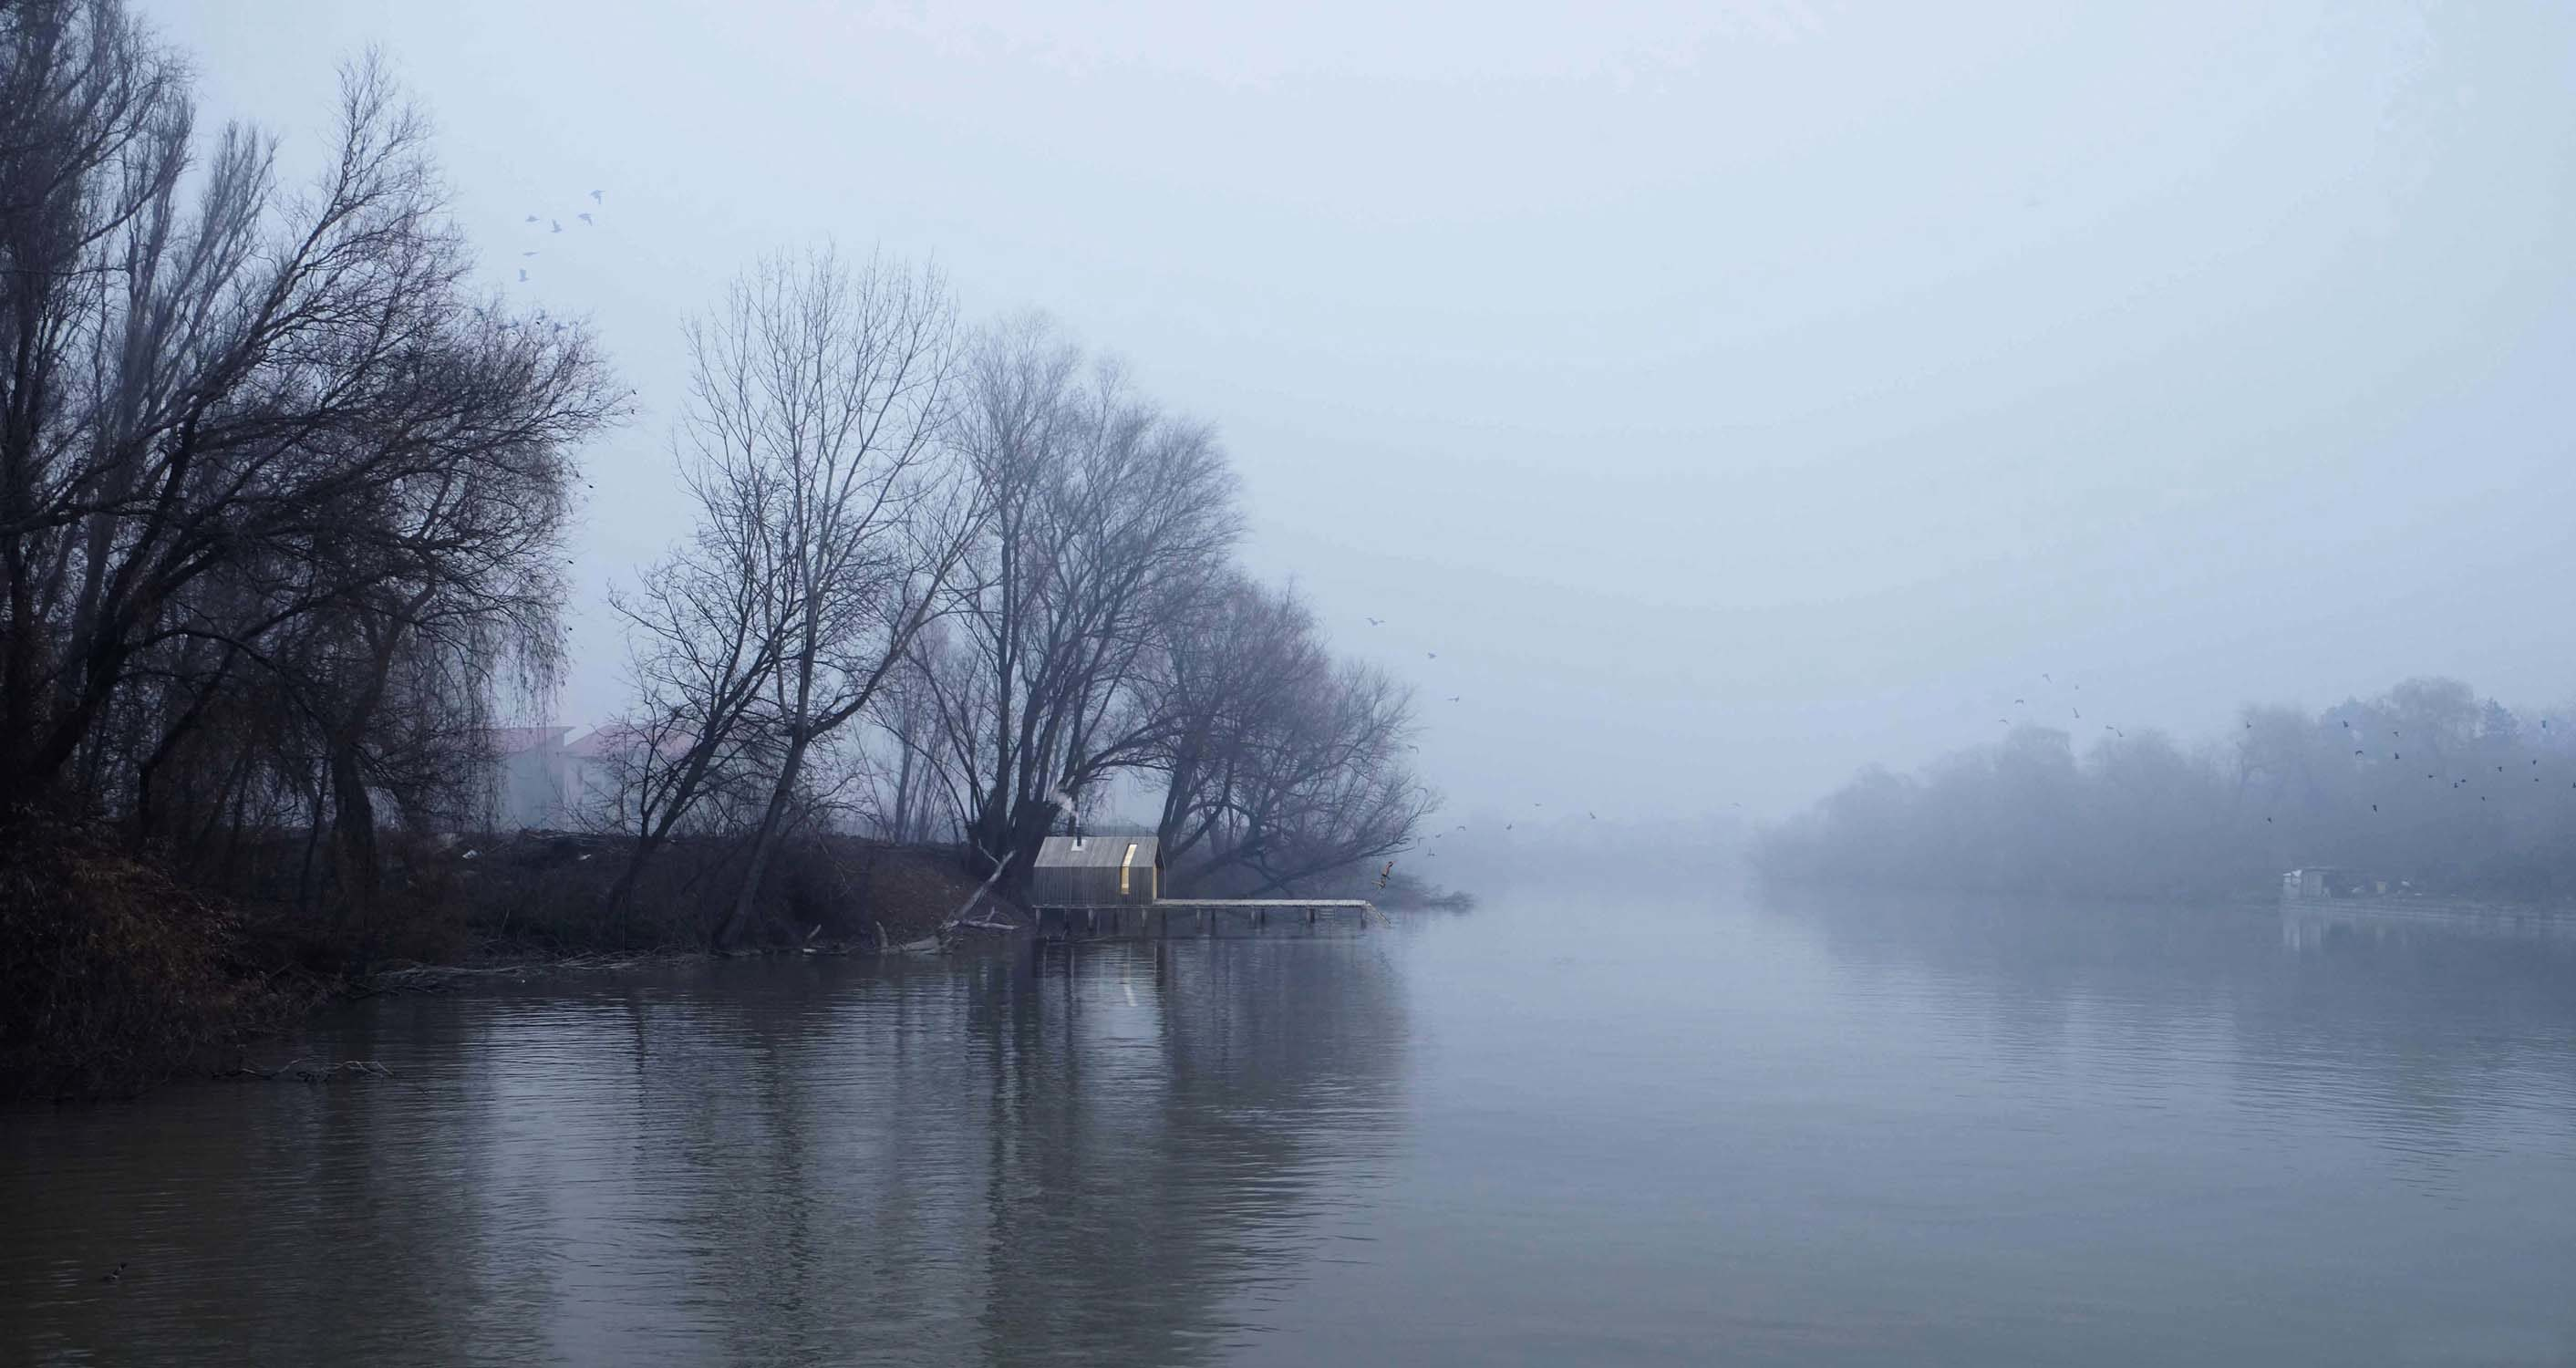 Fog on the lake – Level Creative studio, 2016